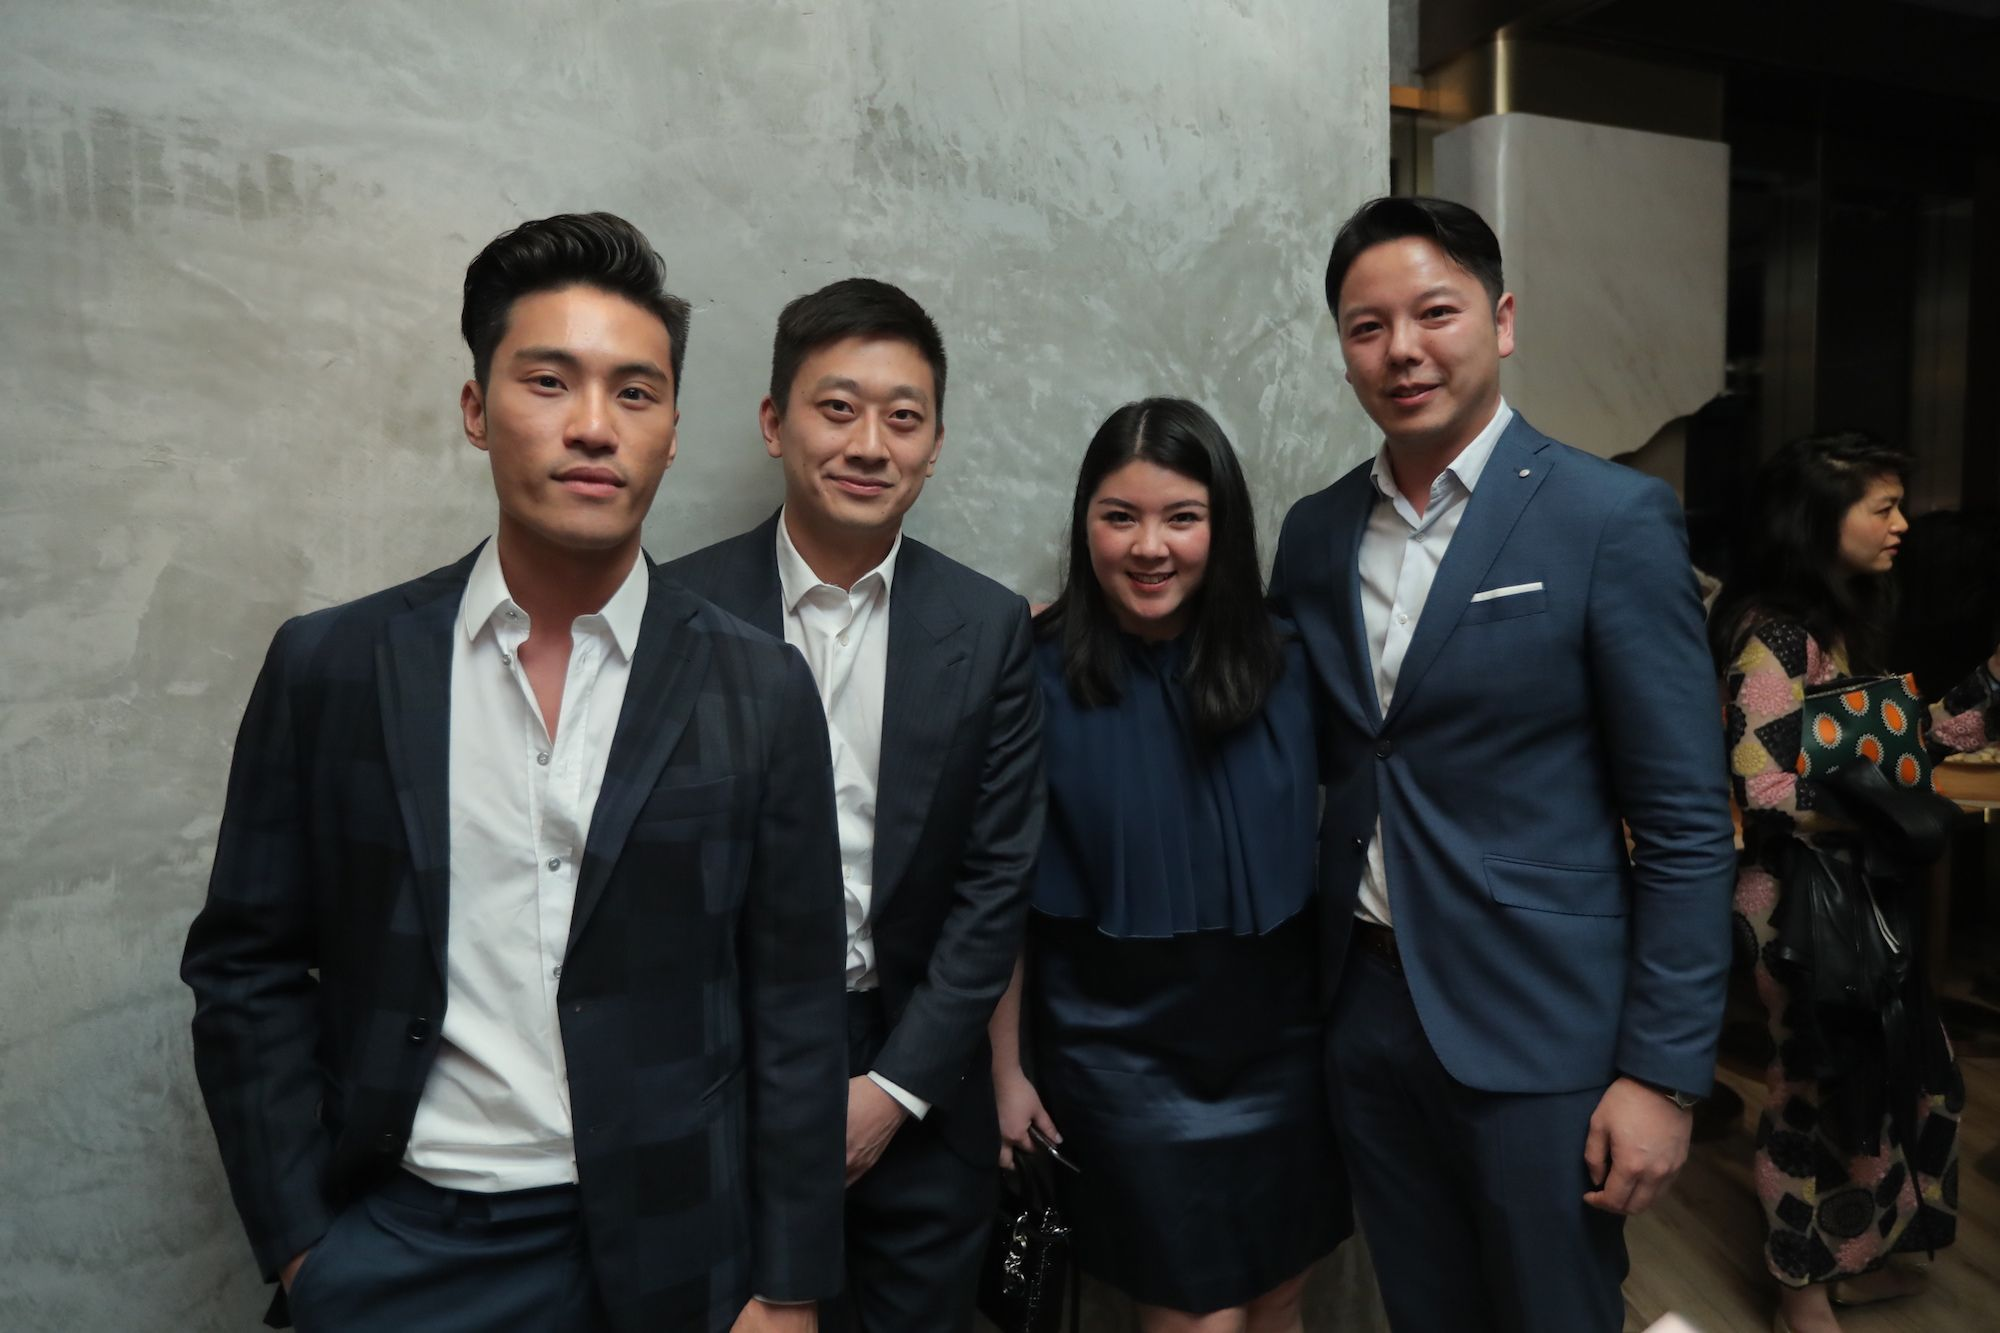 Loui Lim, Mu Chen, Amy Lee, James Ung